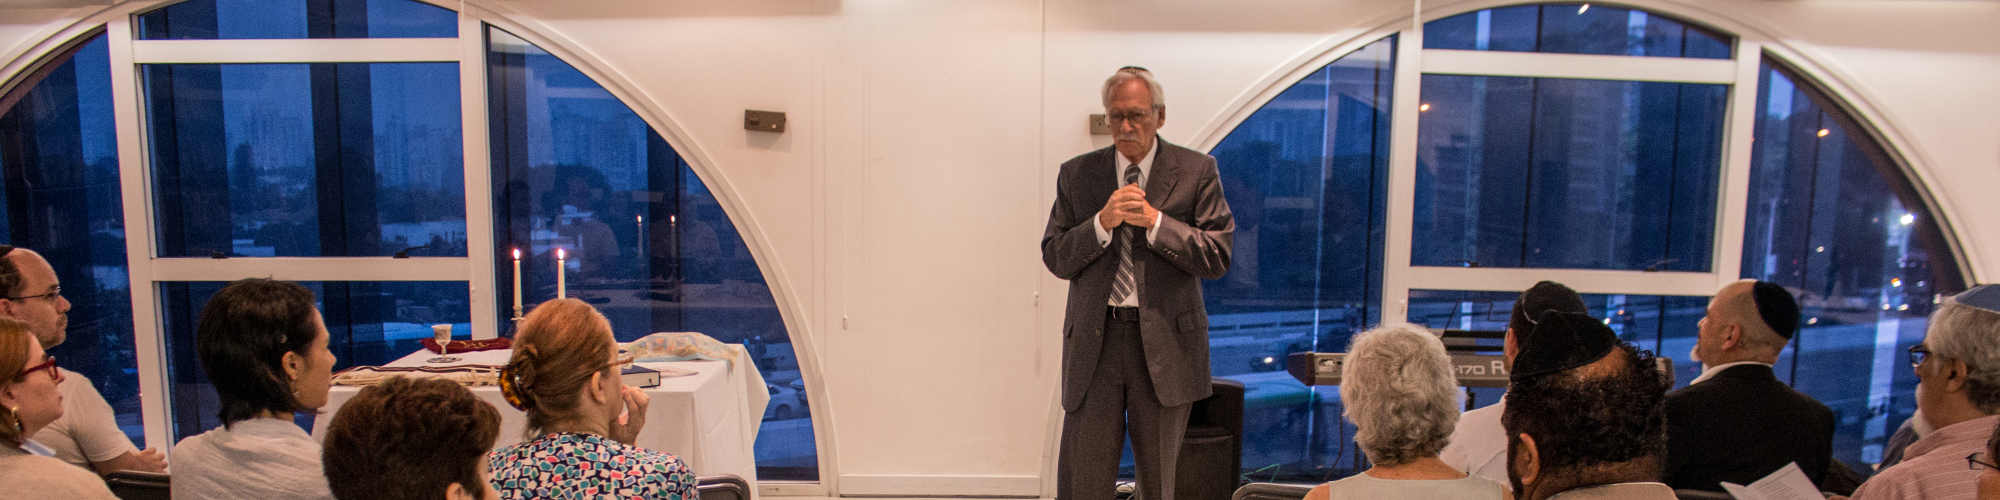 Raul Meyer realiza 8ª cerimônia educativa de Kabalat Shabat